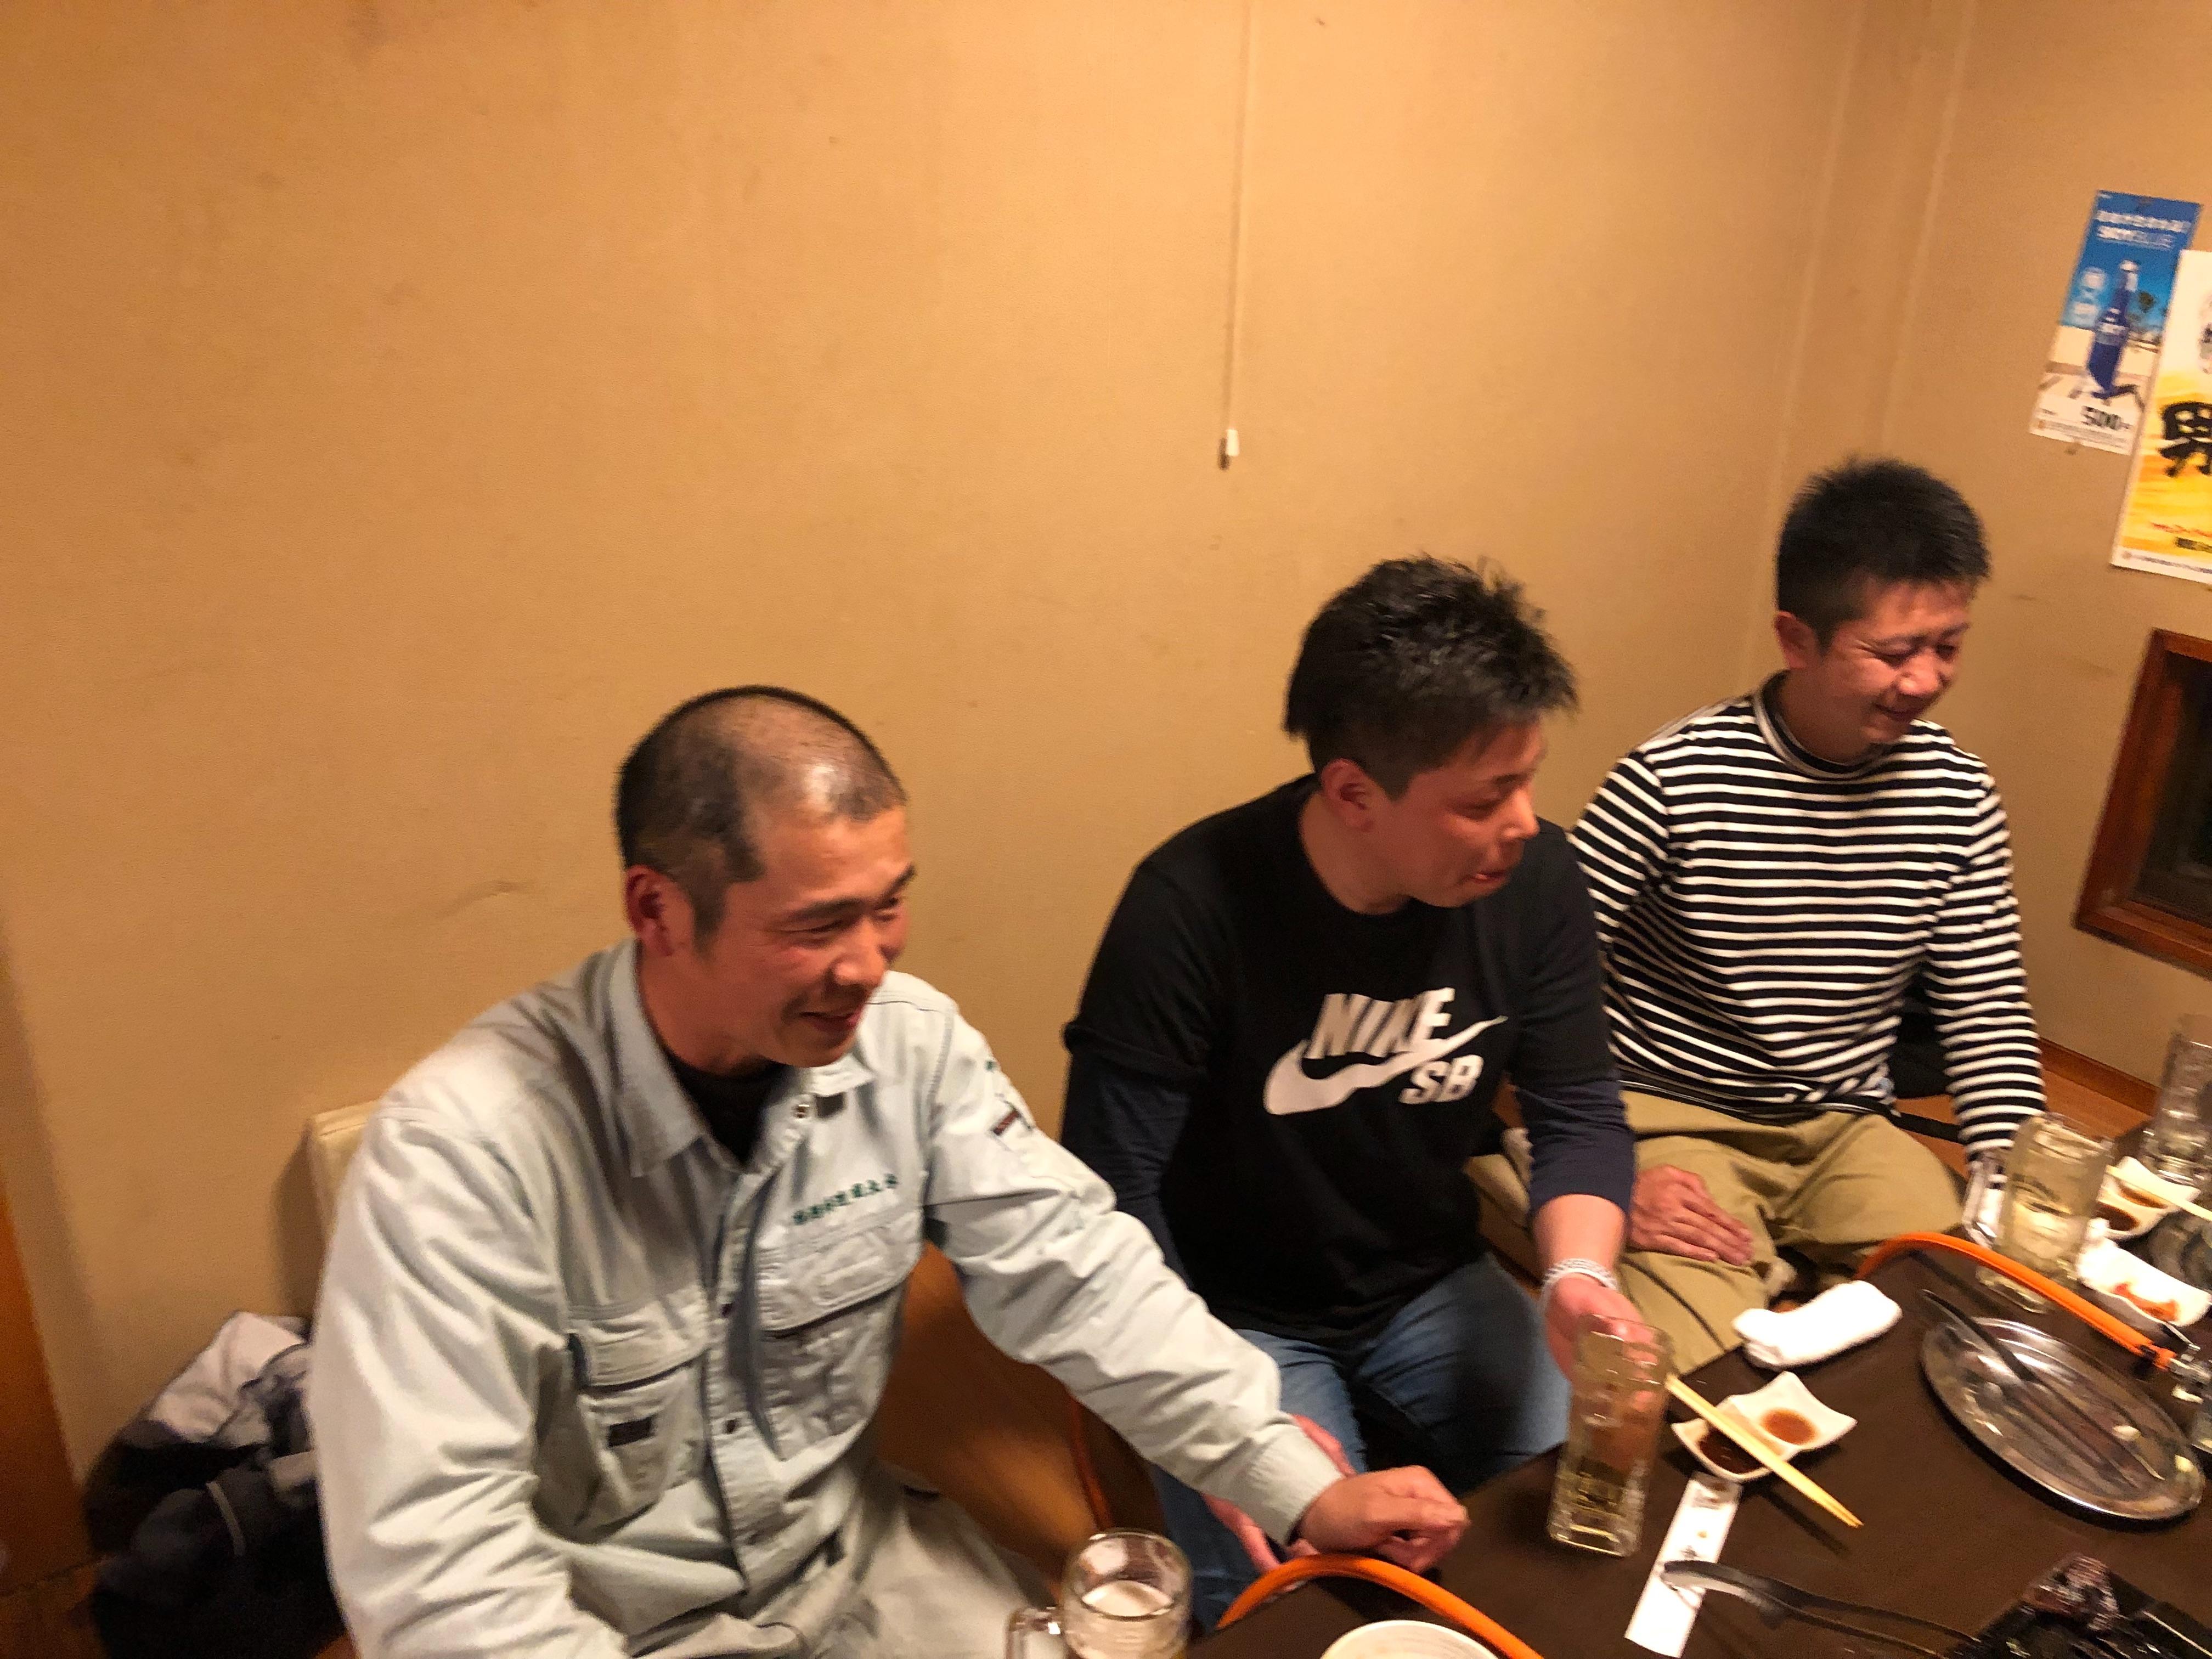 f:id:masanori-kato1972:20190329130755j:image